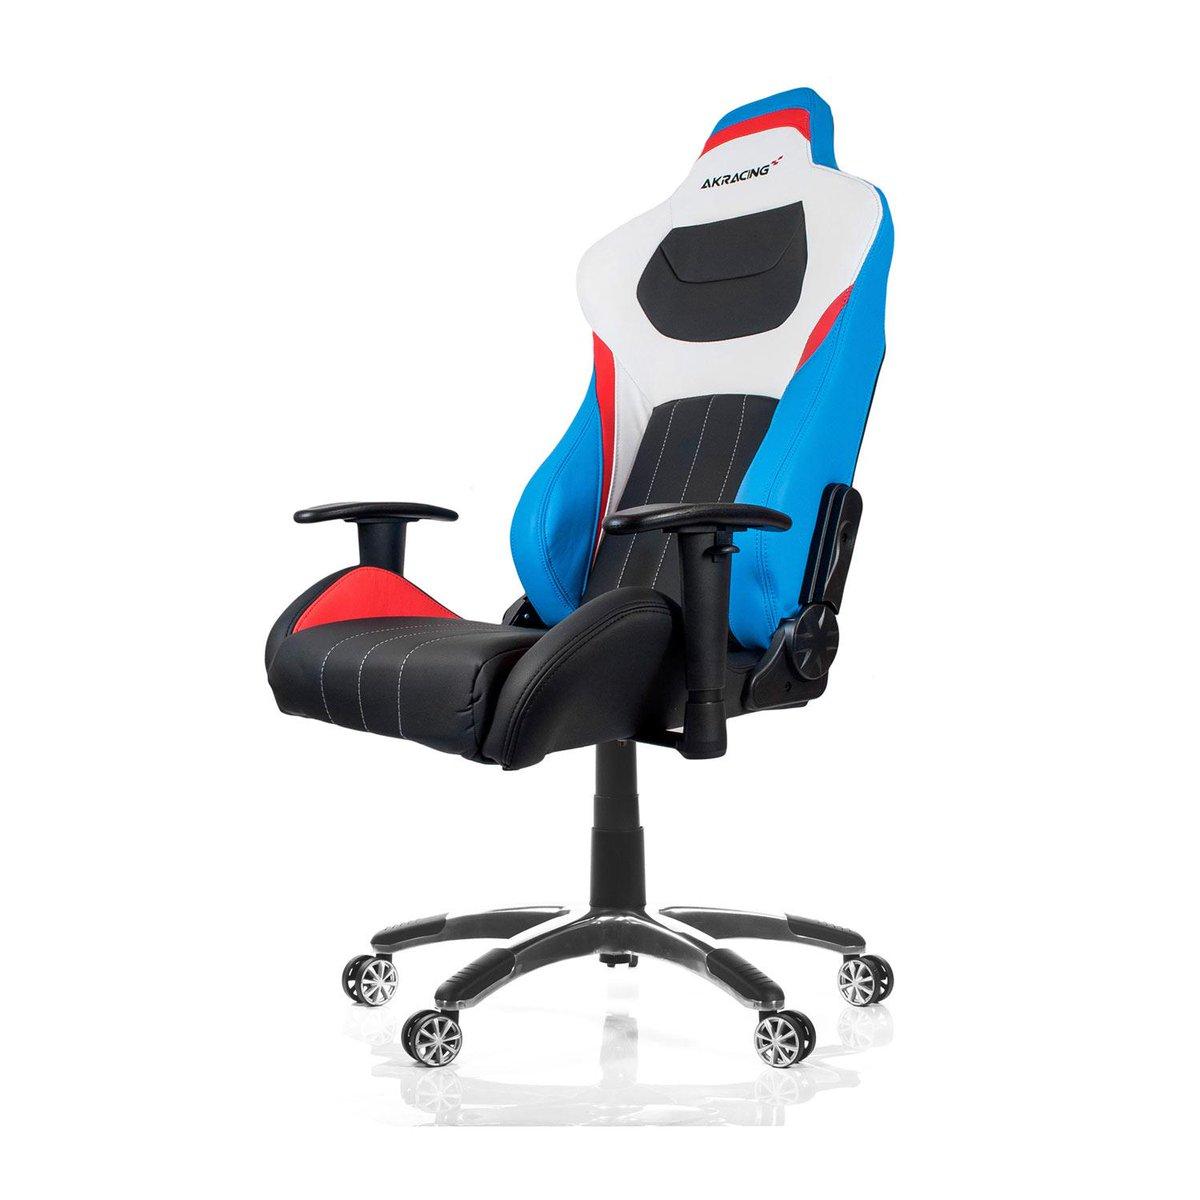 gamer design chaise ldlc de qualité 6a1a2 158c9 6fgyYb7